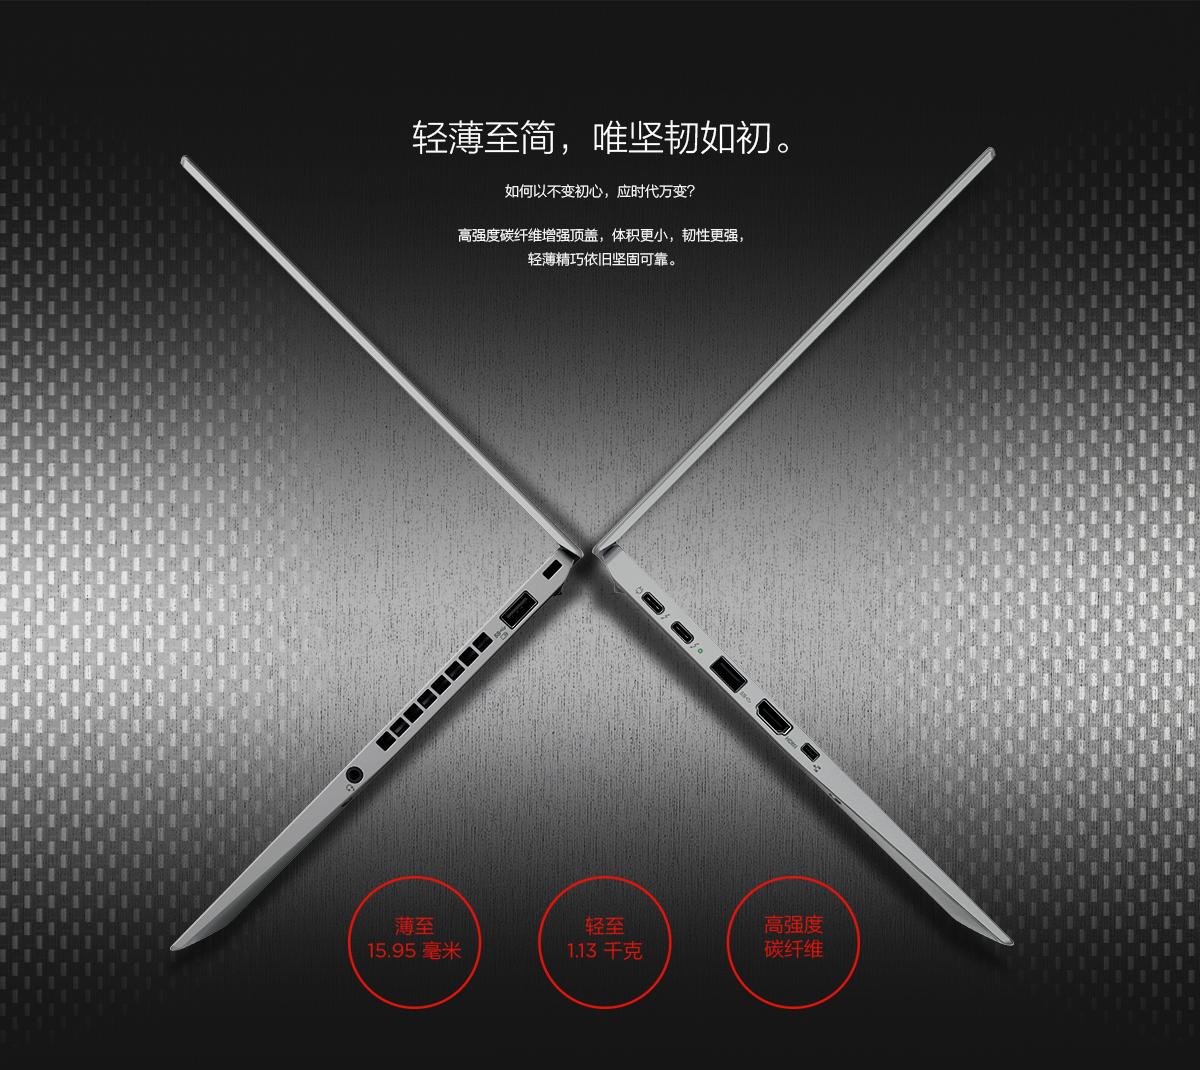 ThinkpadX1 Carbon 2017 银色版(PC)1